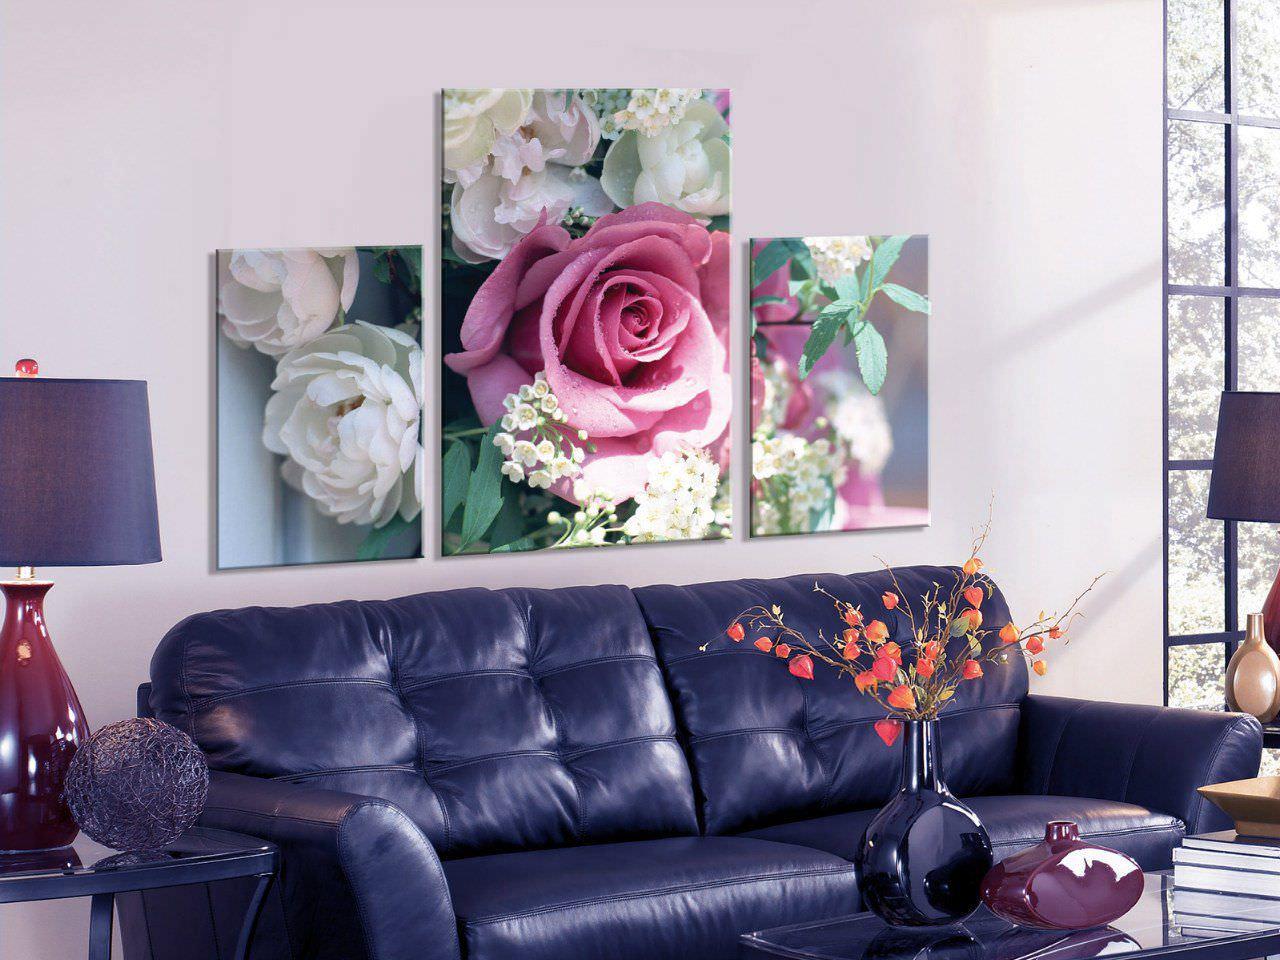 Панорамная картина с розой